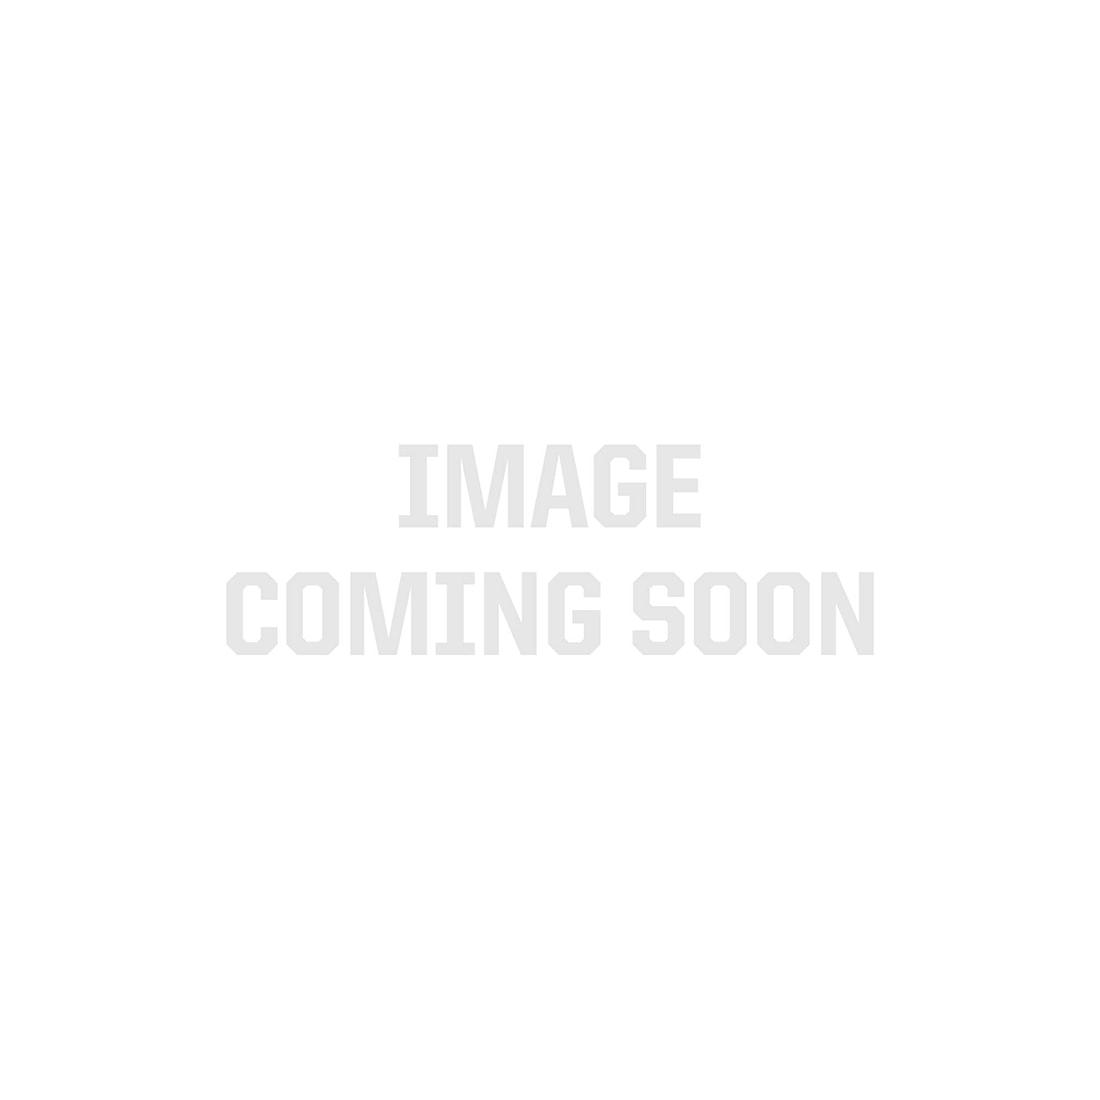 TruColor 2835 LED Strip Light - 6,500K - 160/m - CurrentControl - 5m Reel